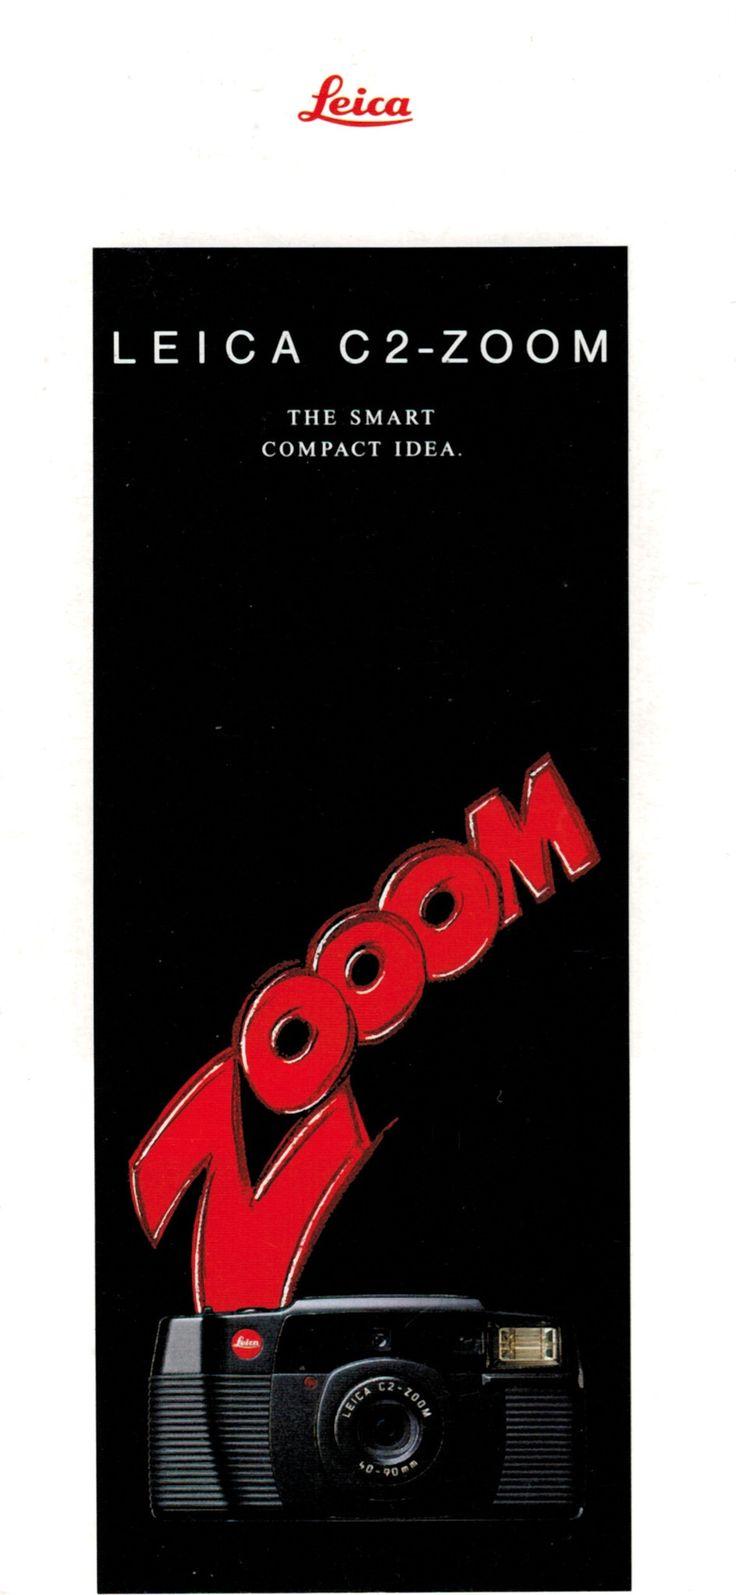 Leica C2-Zoom camera sales brochure 1991 original Leitz pamphlet